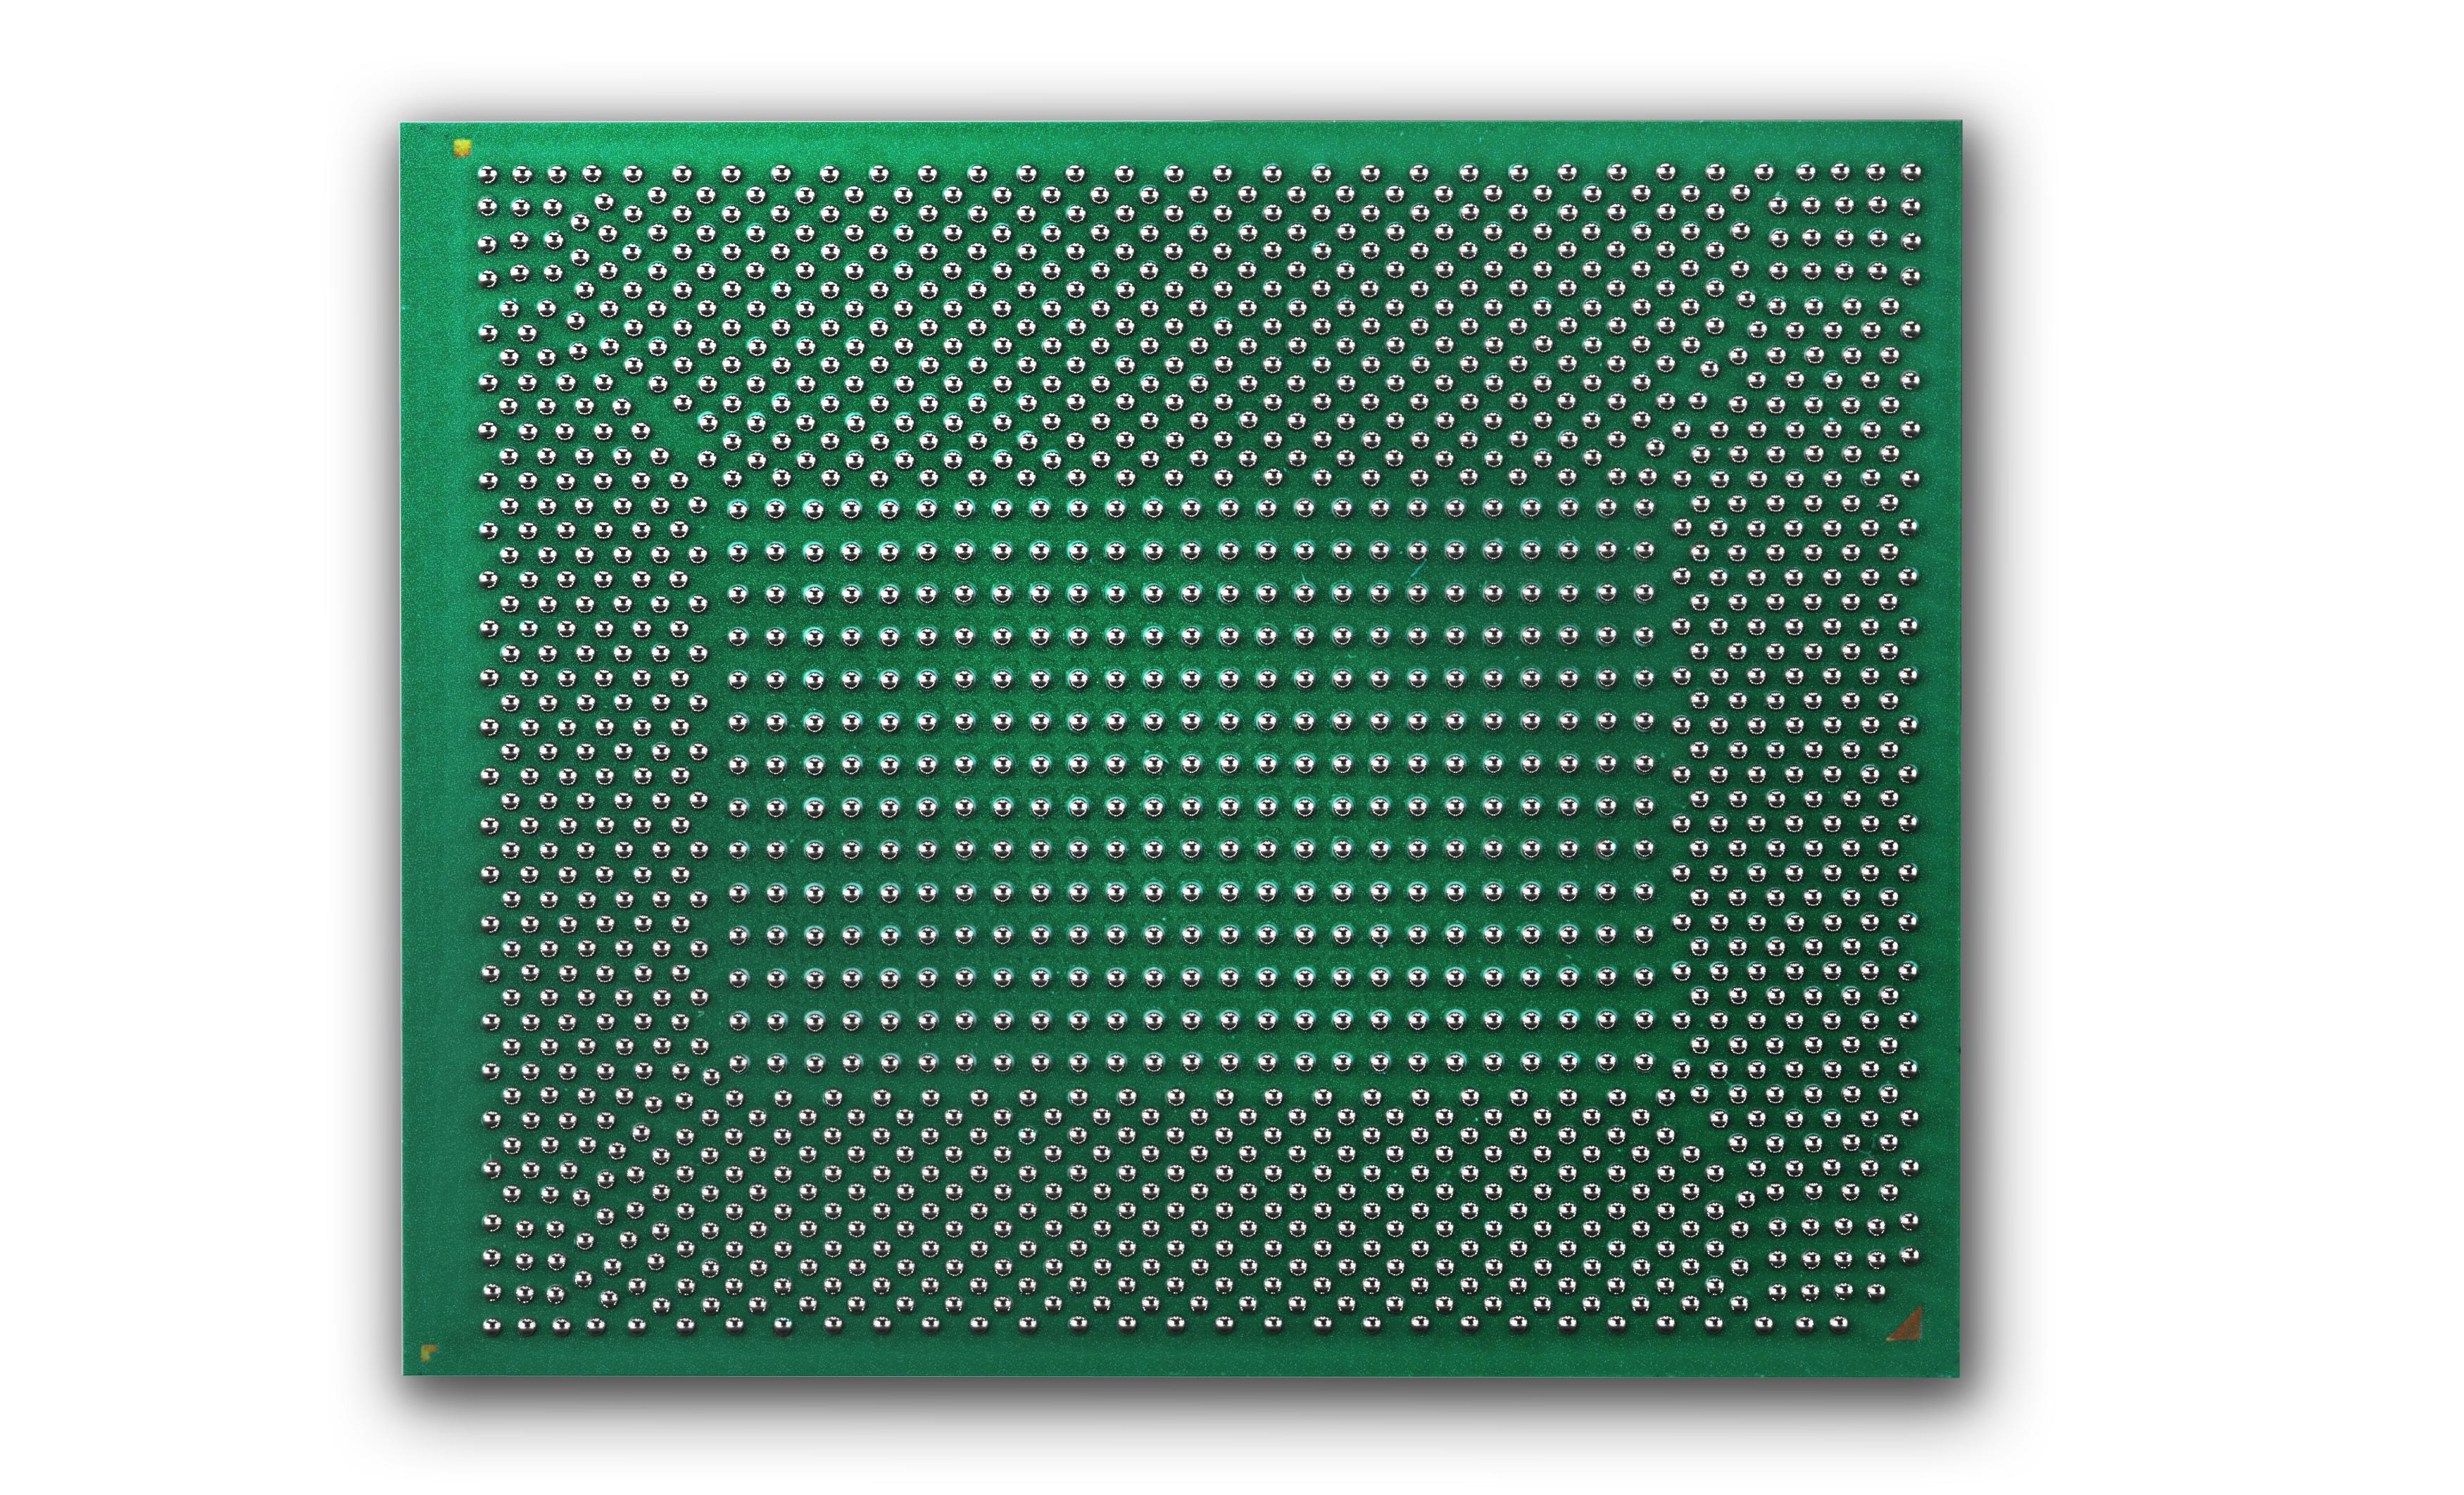 7th Gen Intel Core Y-series back